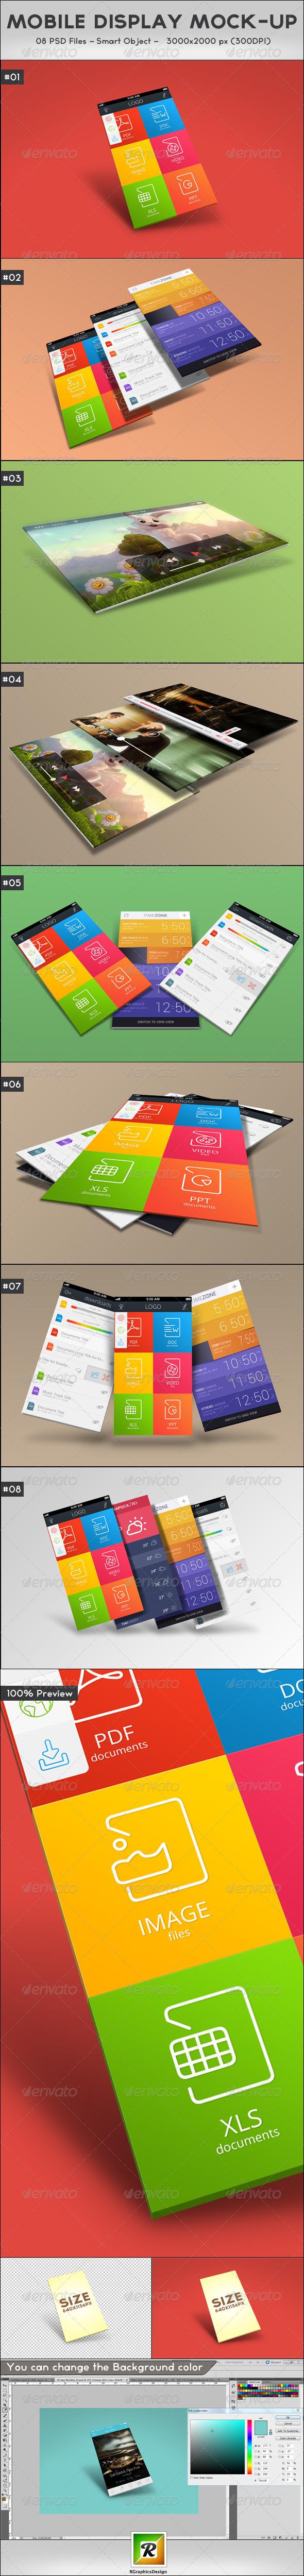 GraphicRiver Mobile Display Mock-Up 5545991